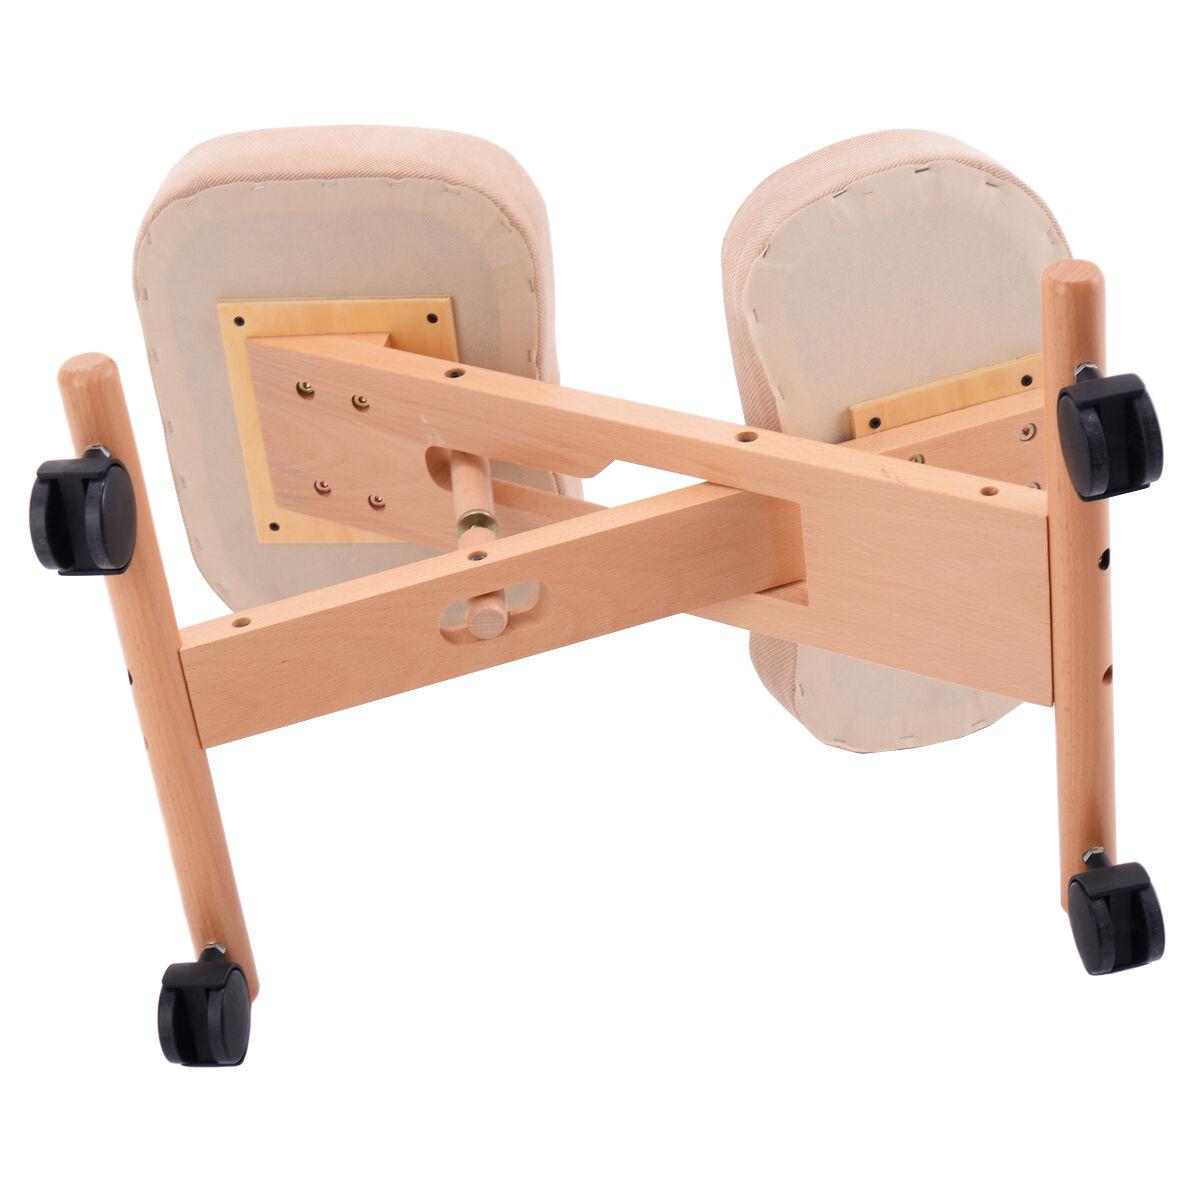 Wooden Chair Kneeling Orthopaedic Stool Ergonomic Posture